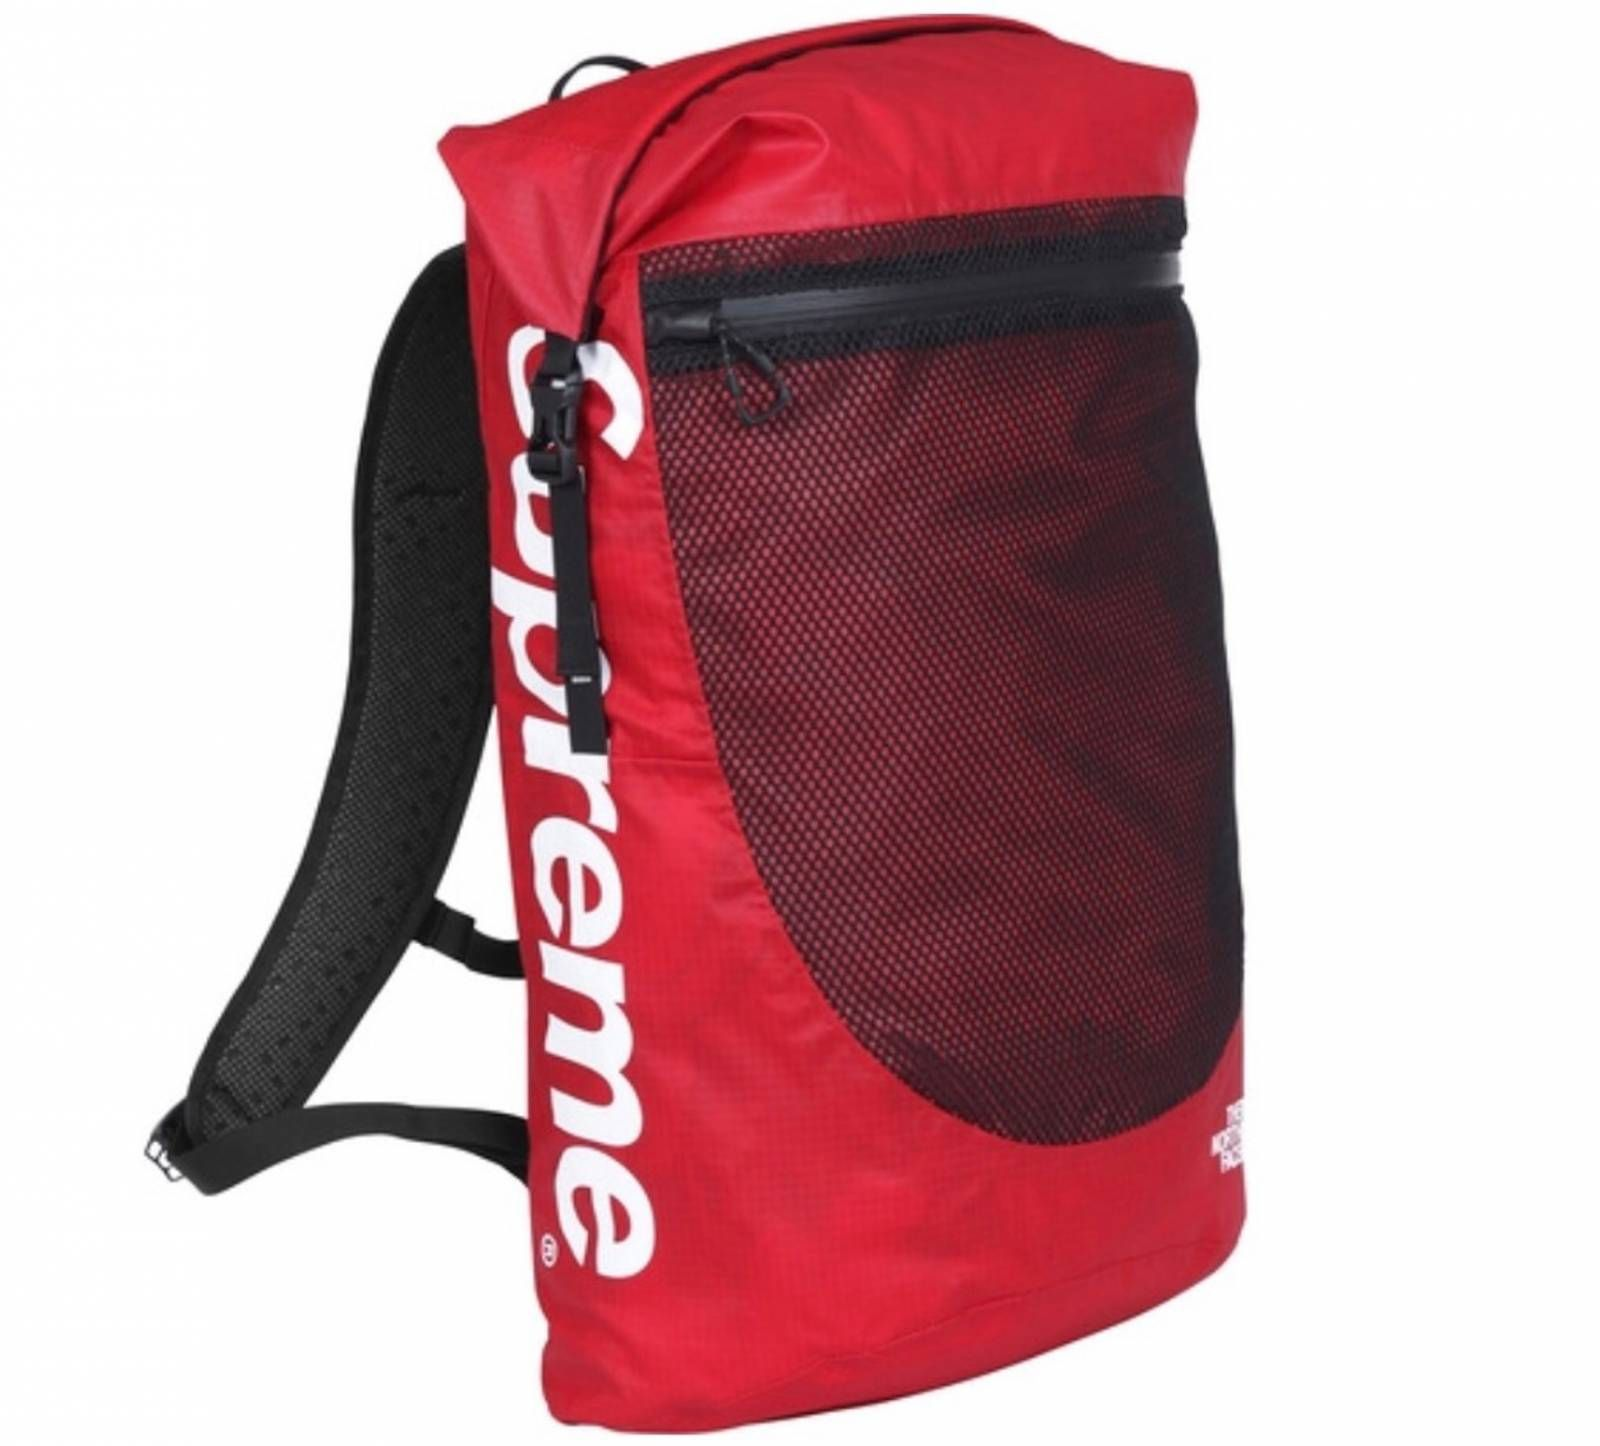 1e62f3dae Supreme x The North Face Waterproof Backpack | Supreme heaven ...